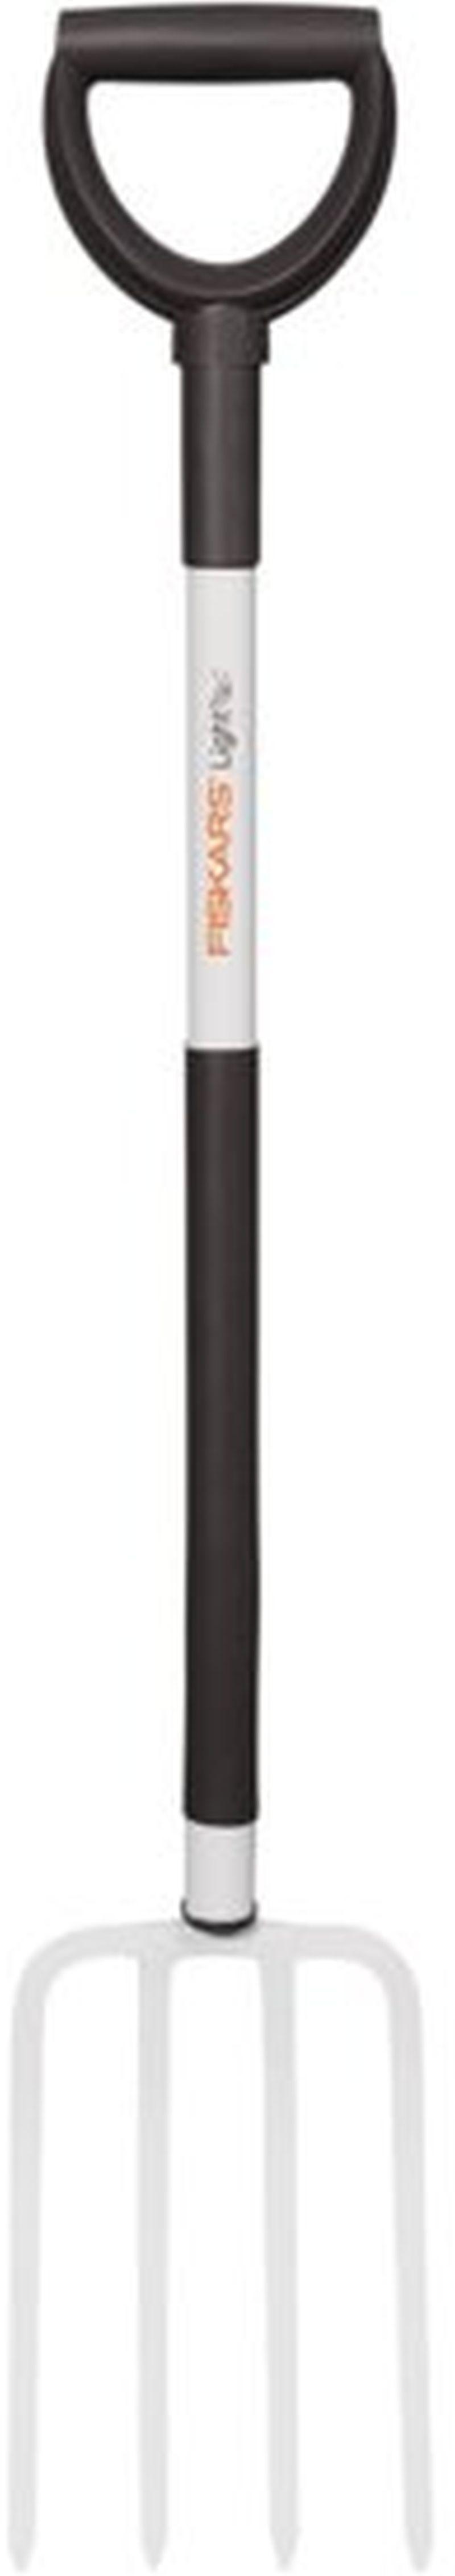 Fiskars Light Lehké rycí vidle 113 cm (133503) 1019603